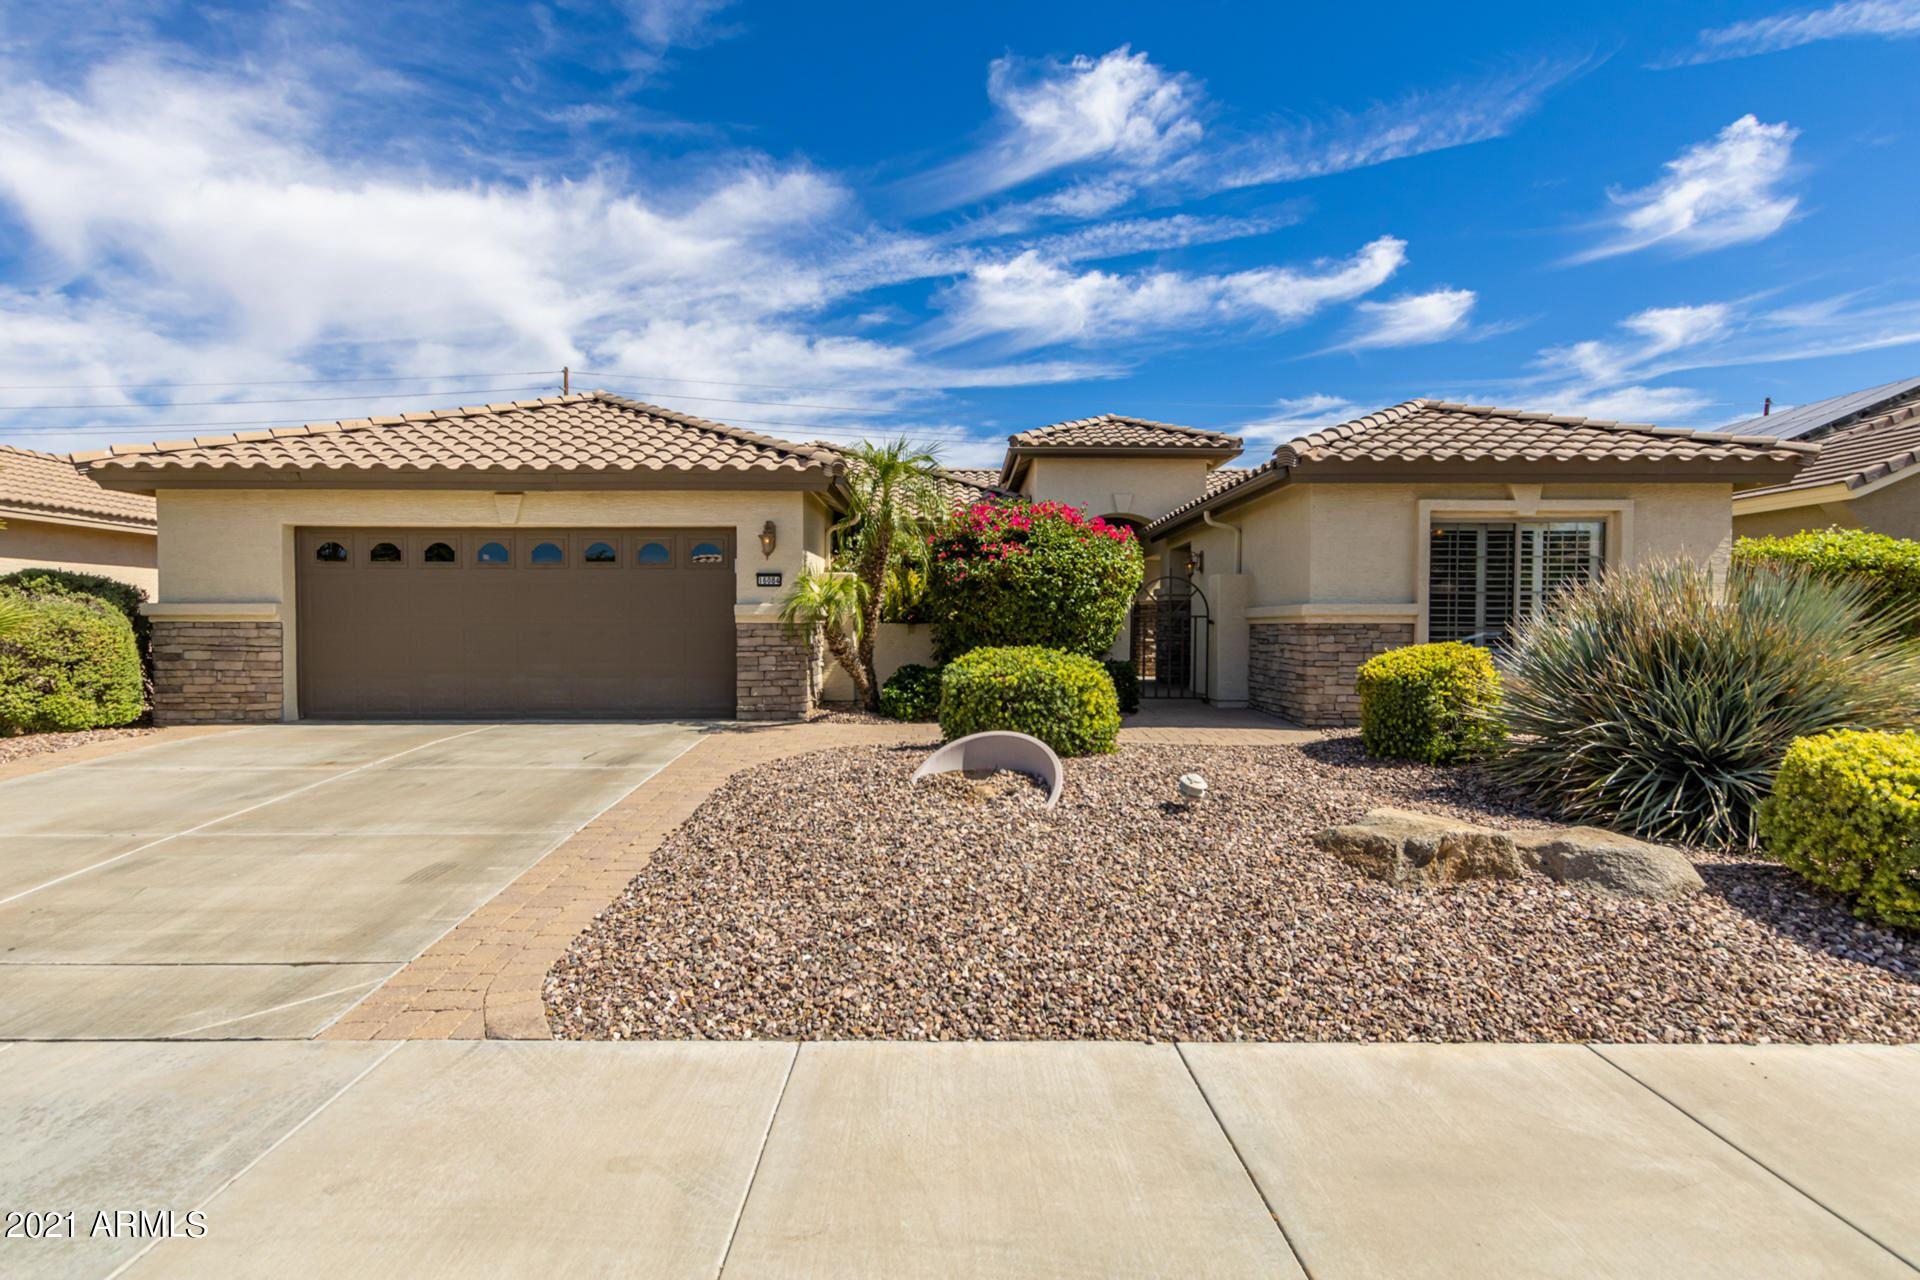 Photo of 16084 W EDGEMONT Avenue, Goodyear, AZ 85395 (MLS # 6248559)